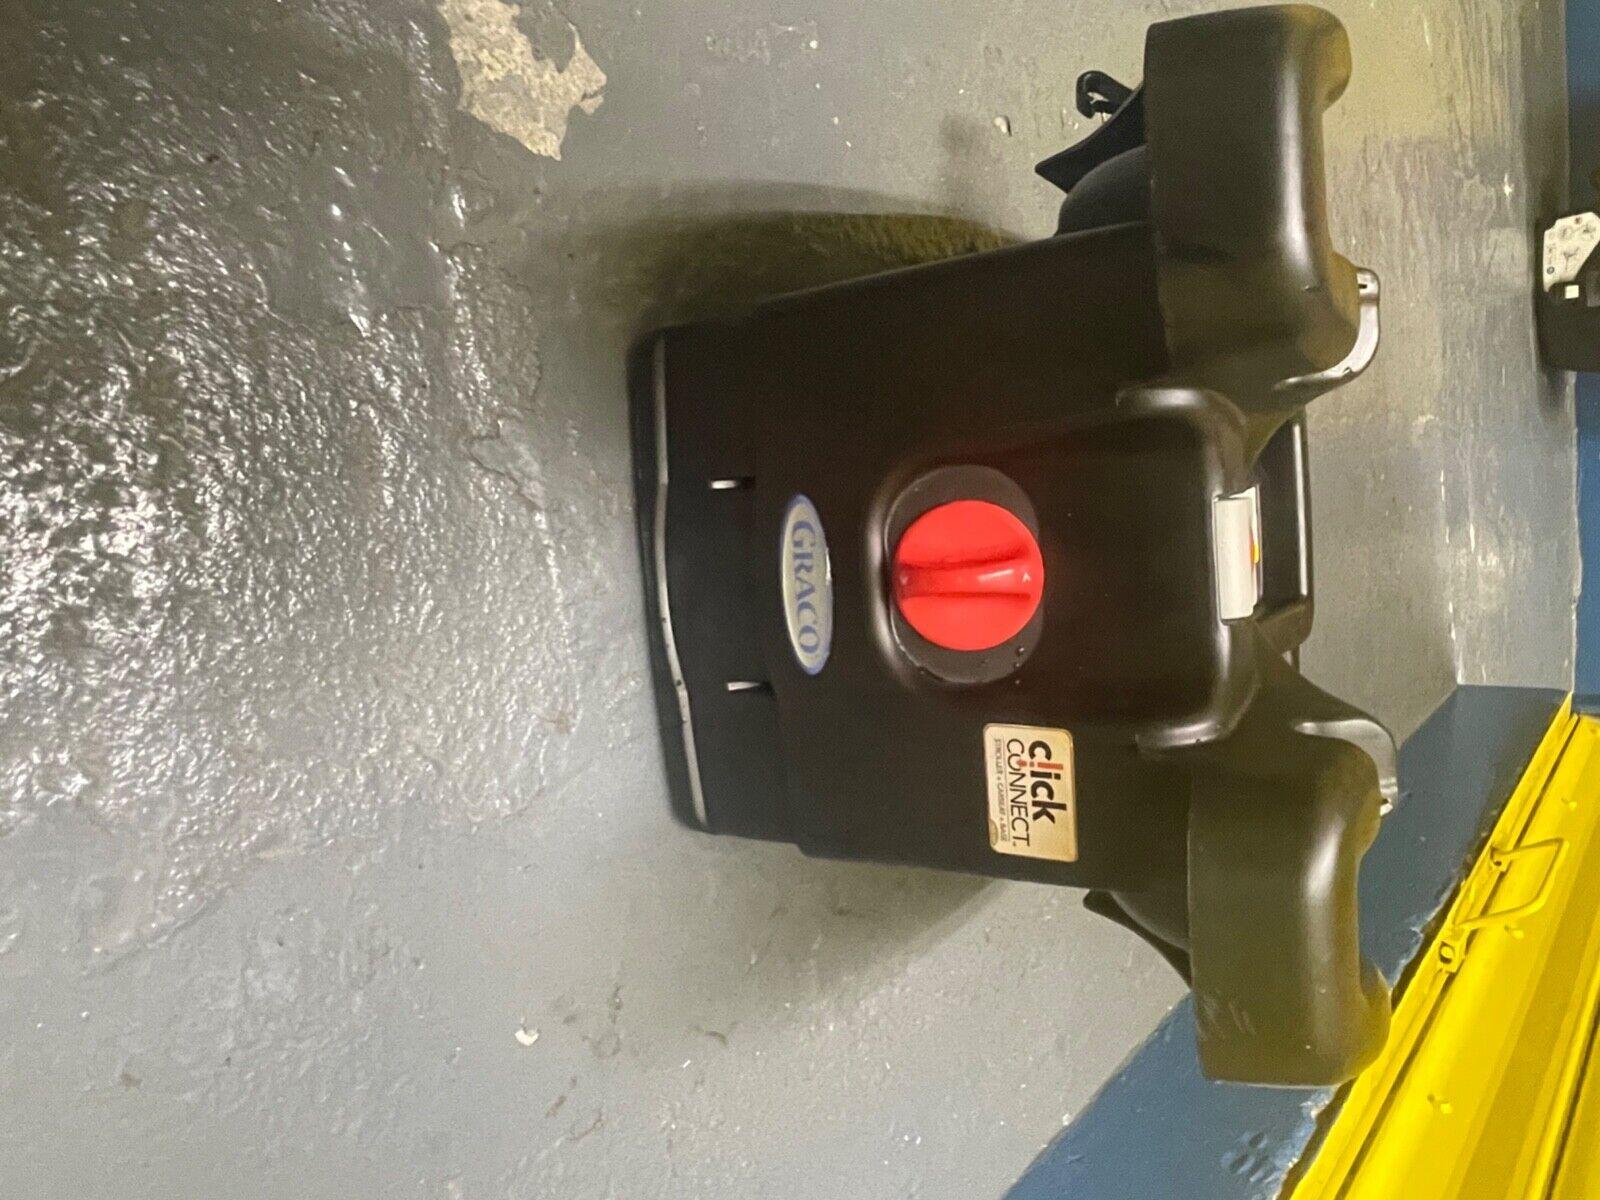 Graco Click Connect Infant Car Seat Base - $7.10